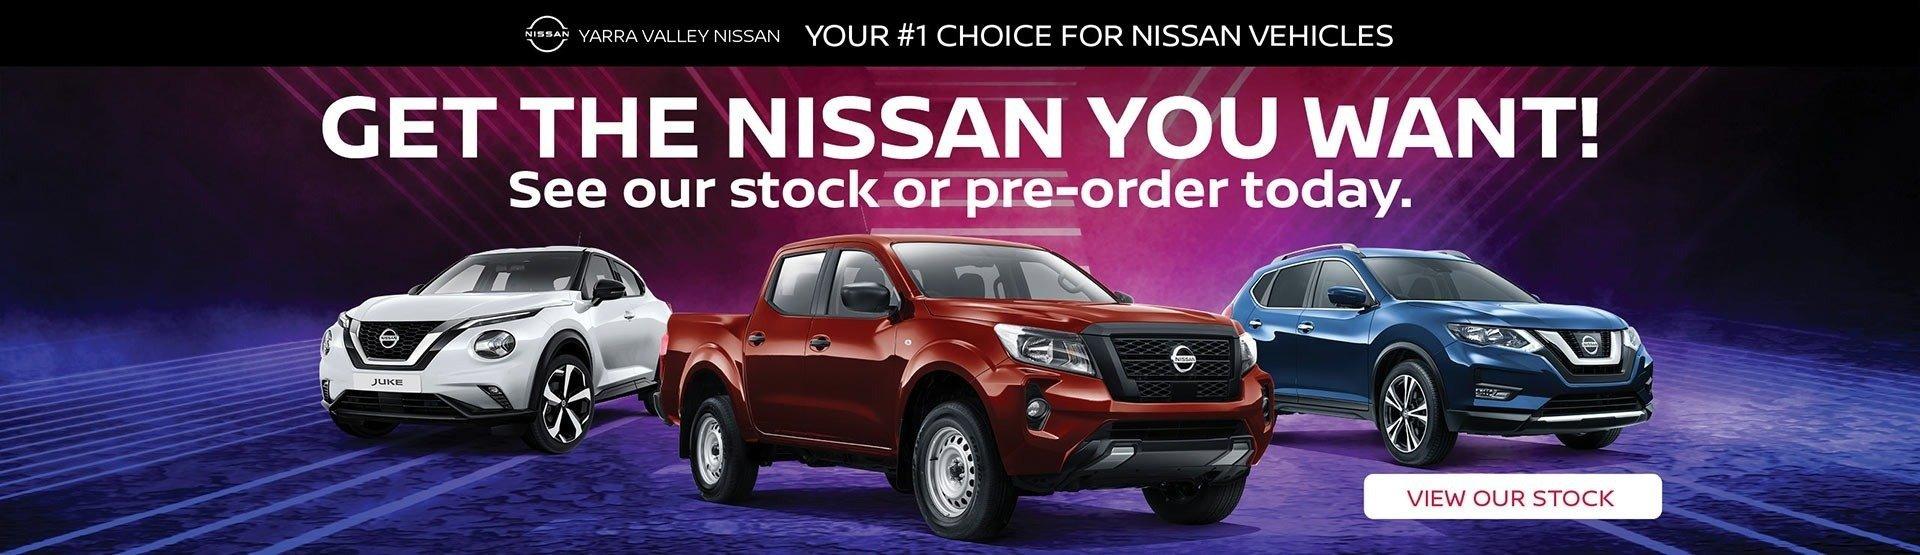 YV Nissan